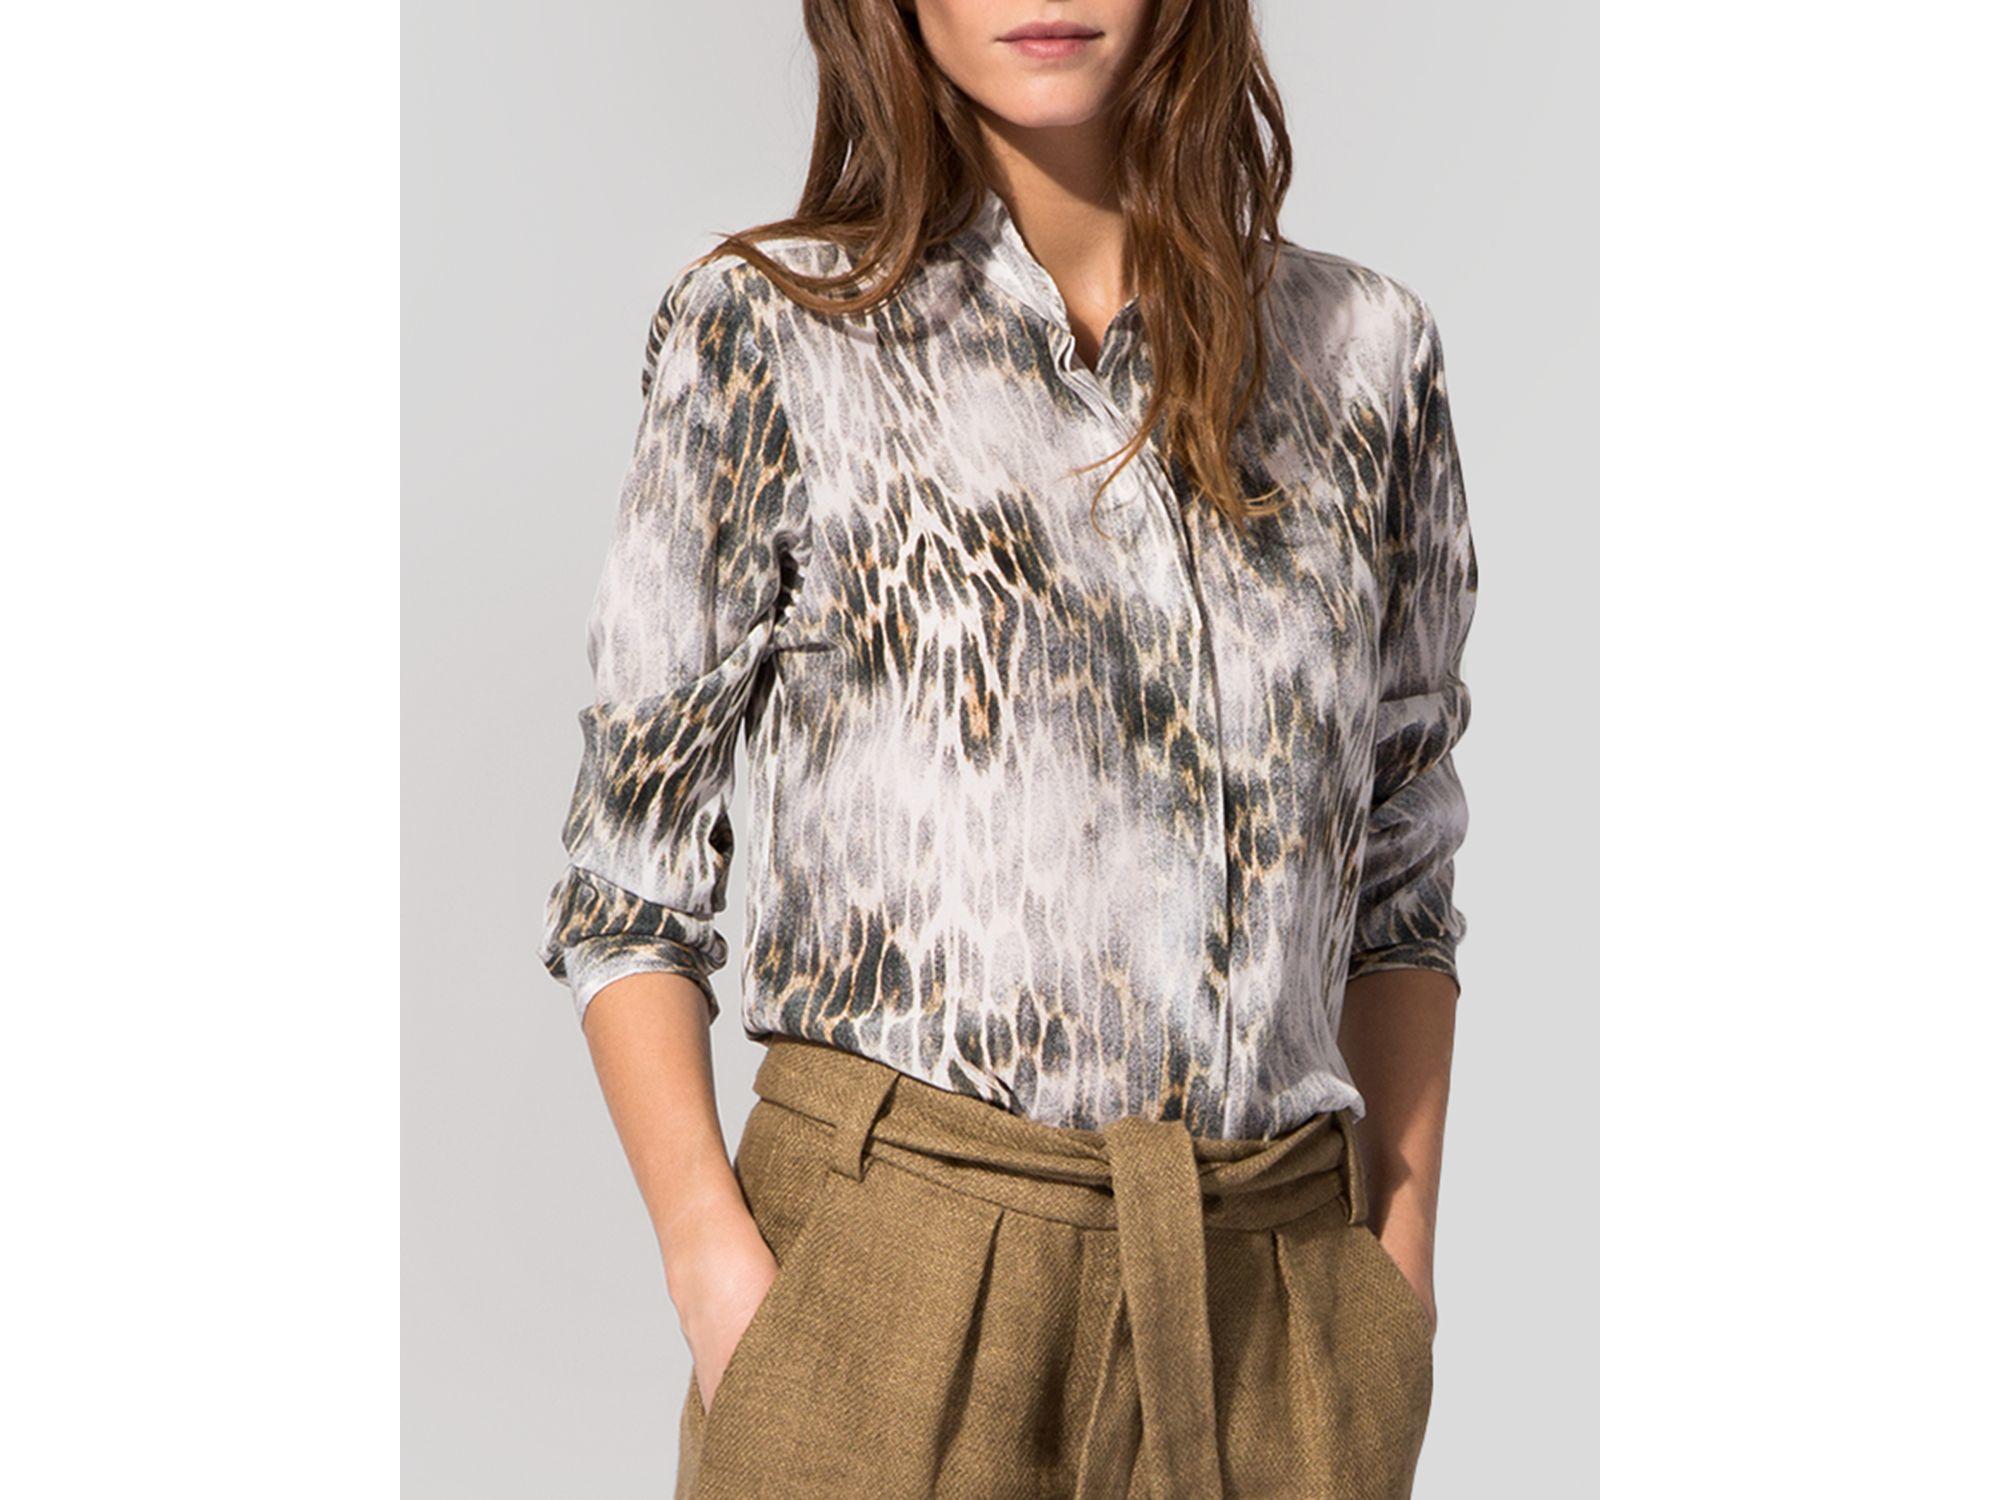 70369aa3d1d11 Lyst - Maje Shirt - Cameleon Print